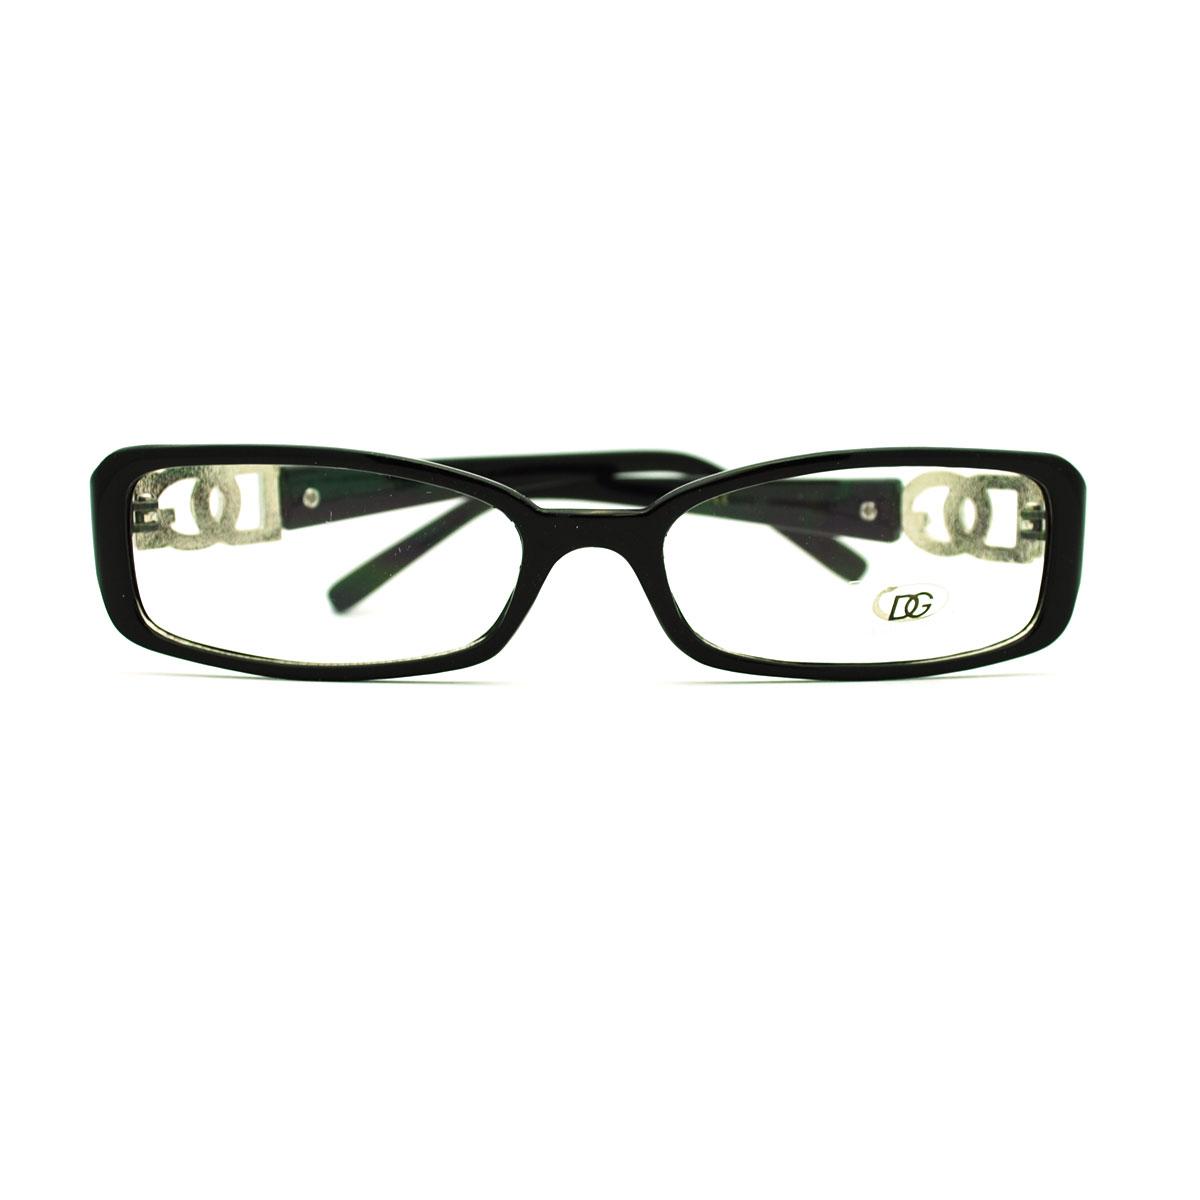 Ladies Eyeglass Frames : Womens Sexy Extra Narrow Rectangular Plastic Frame Eye ...